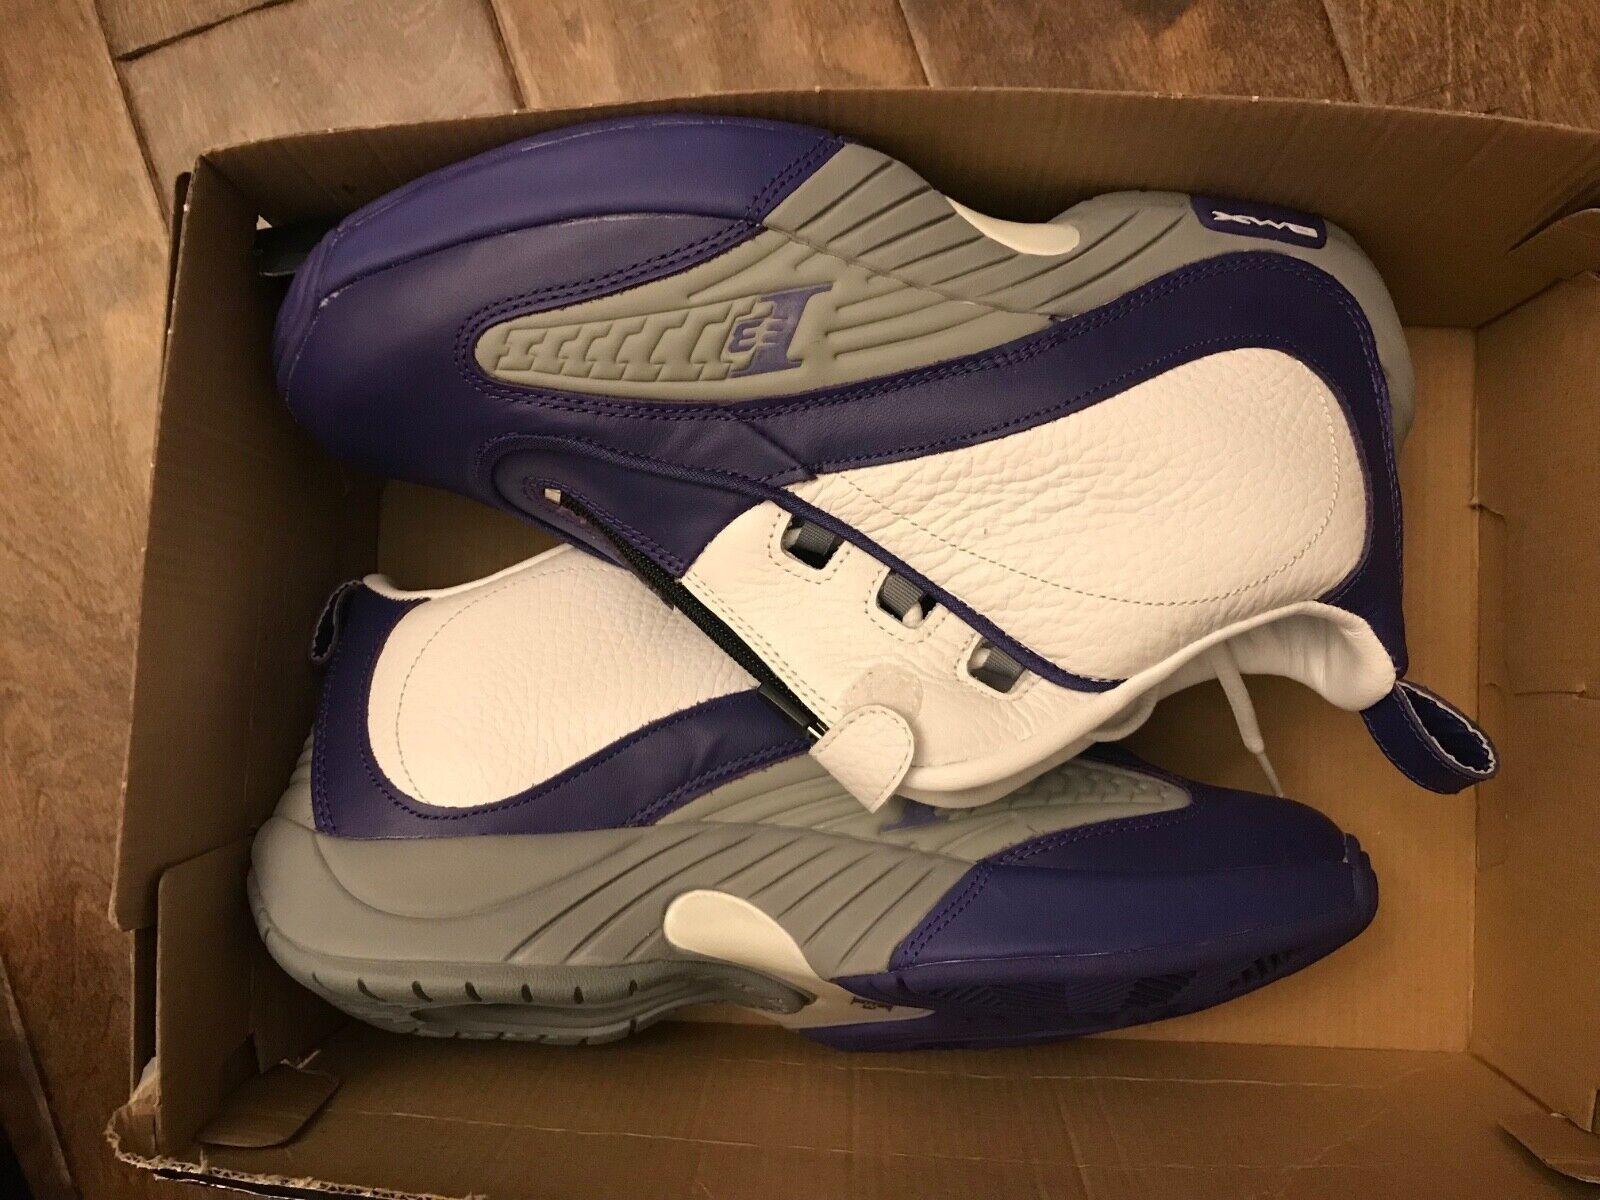 Reebok Answer 4 IV DMX sautope sz 10 tuttien Iverson AI viola bianca Kobe Lakers Sautope classeiche da uomo